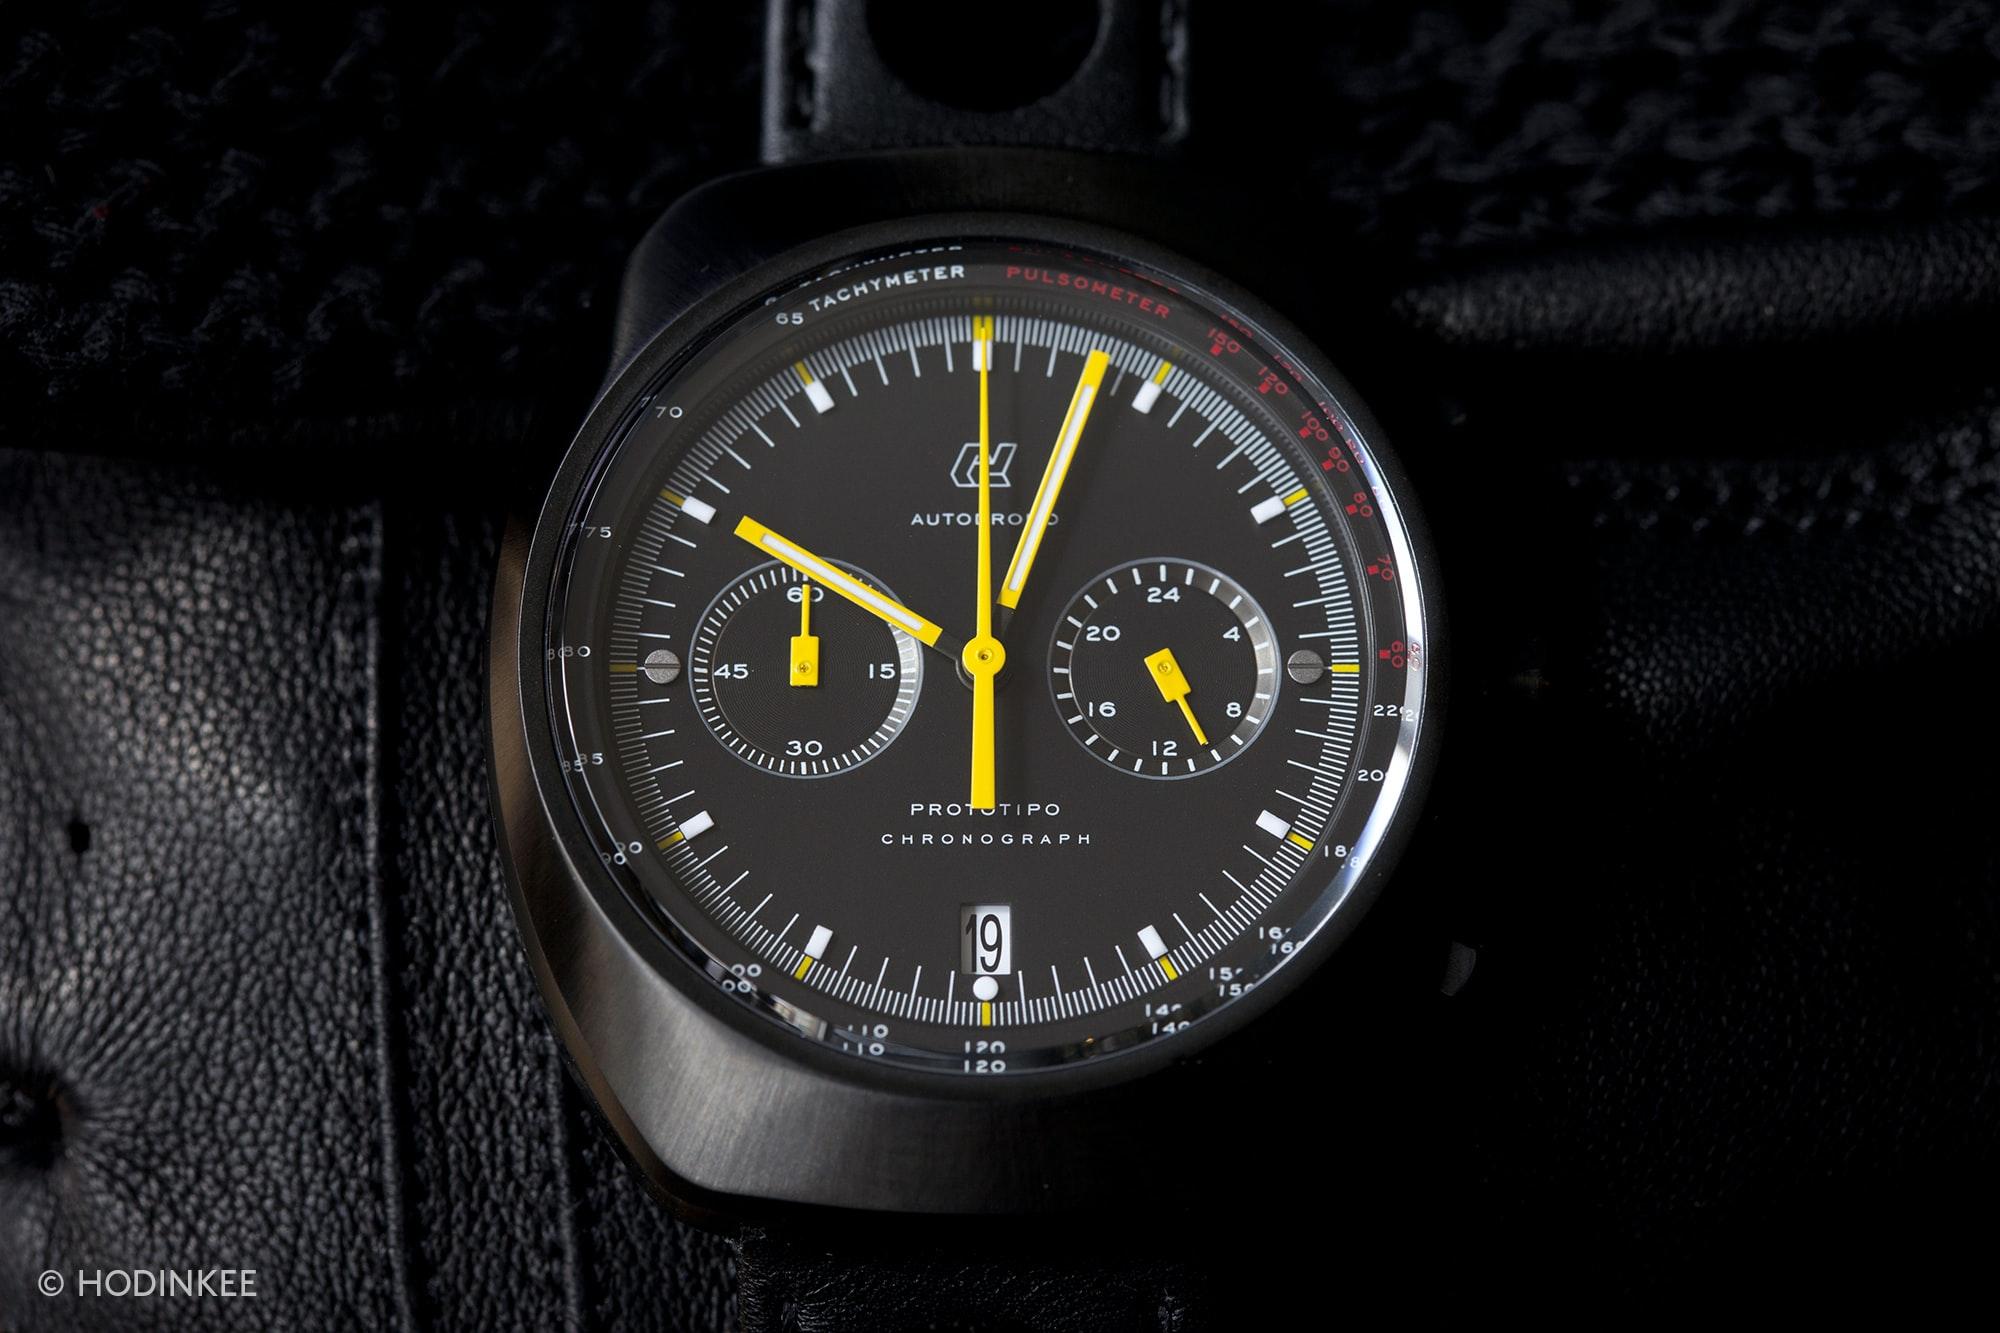 Spike Feresten Autodromo Talking Watches: With Spike Feresten Talking Watches: With Spike Feresten  MG 9930 copy 2